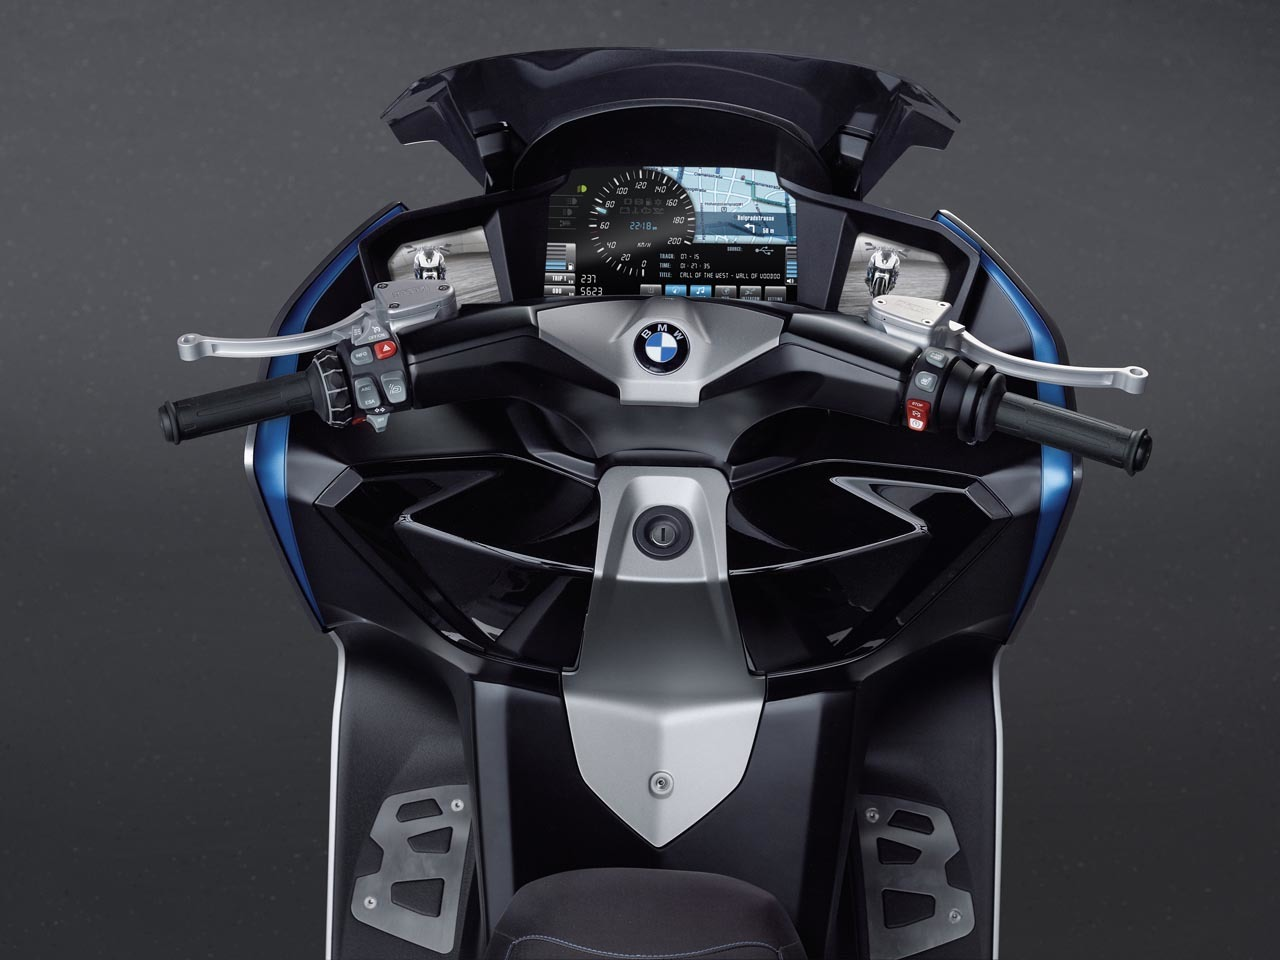 Foto de BMW Concept C Scooter, el Scooter del futuro según BMW (14/19)